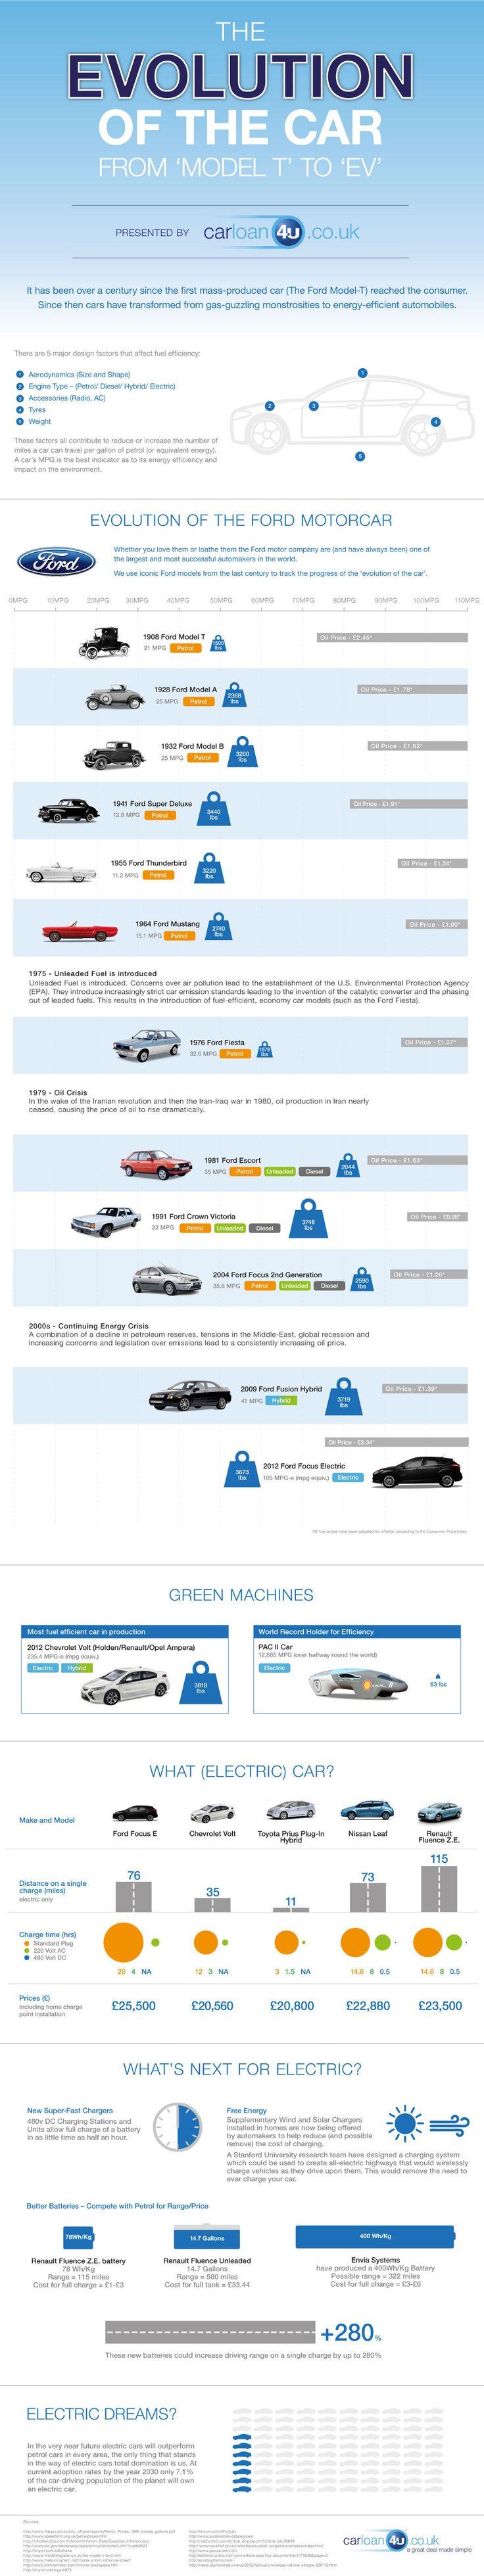 Evolution of the Car